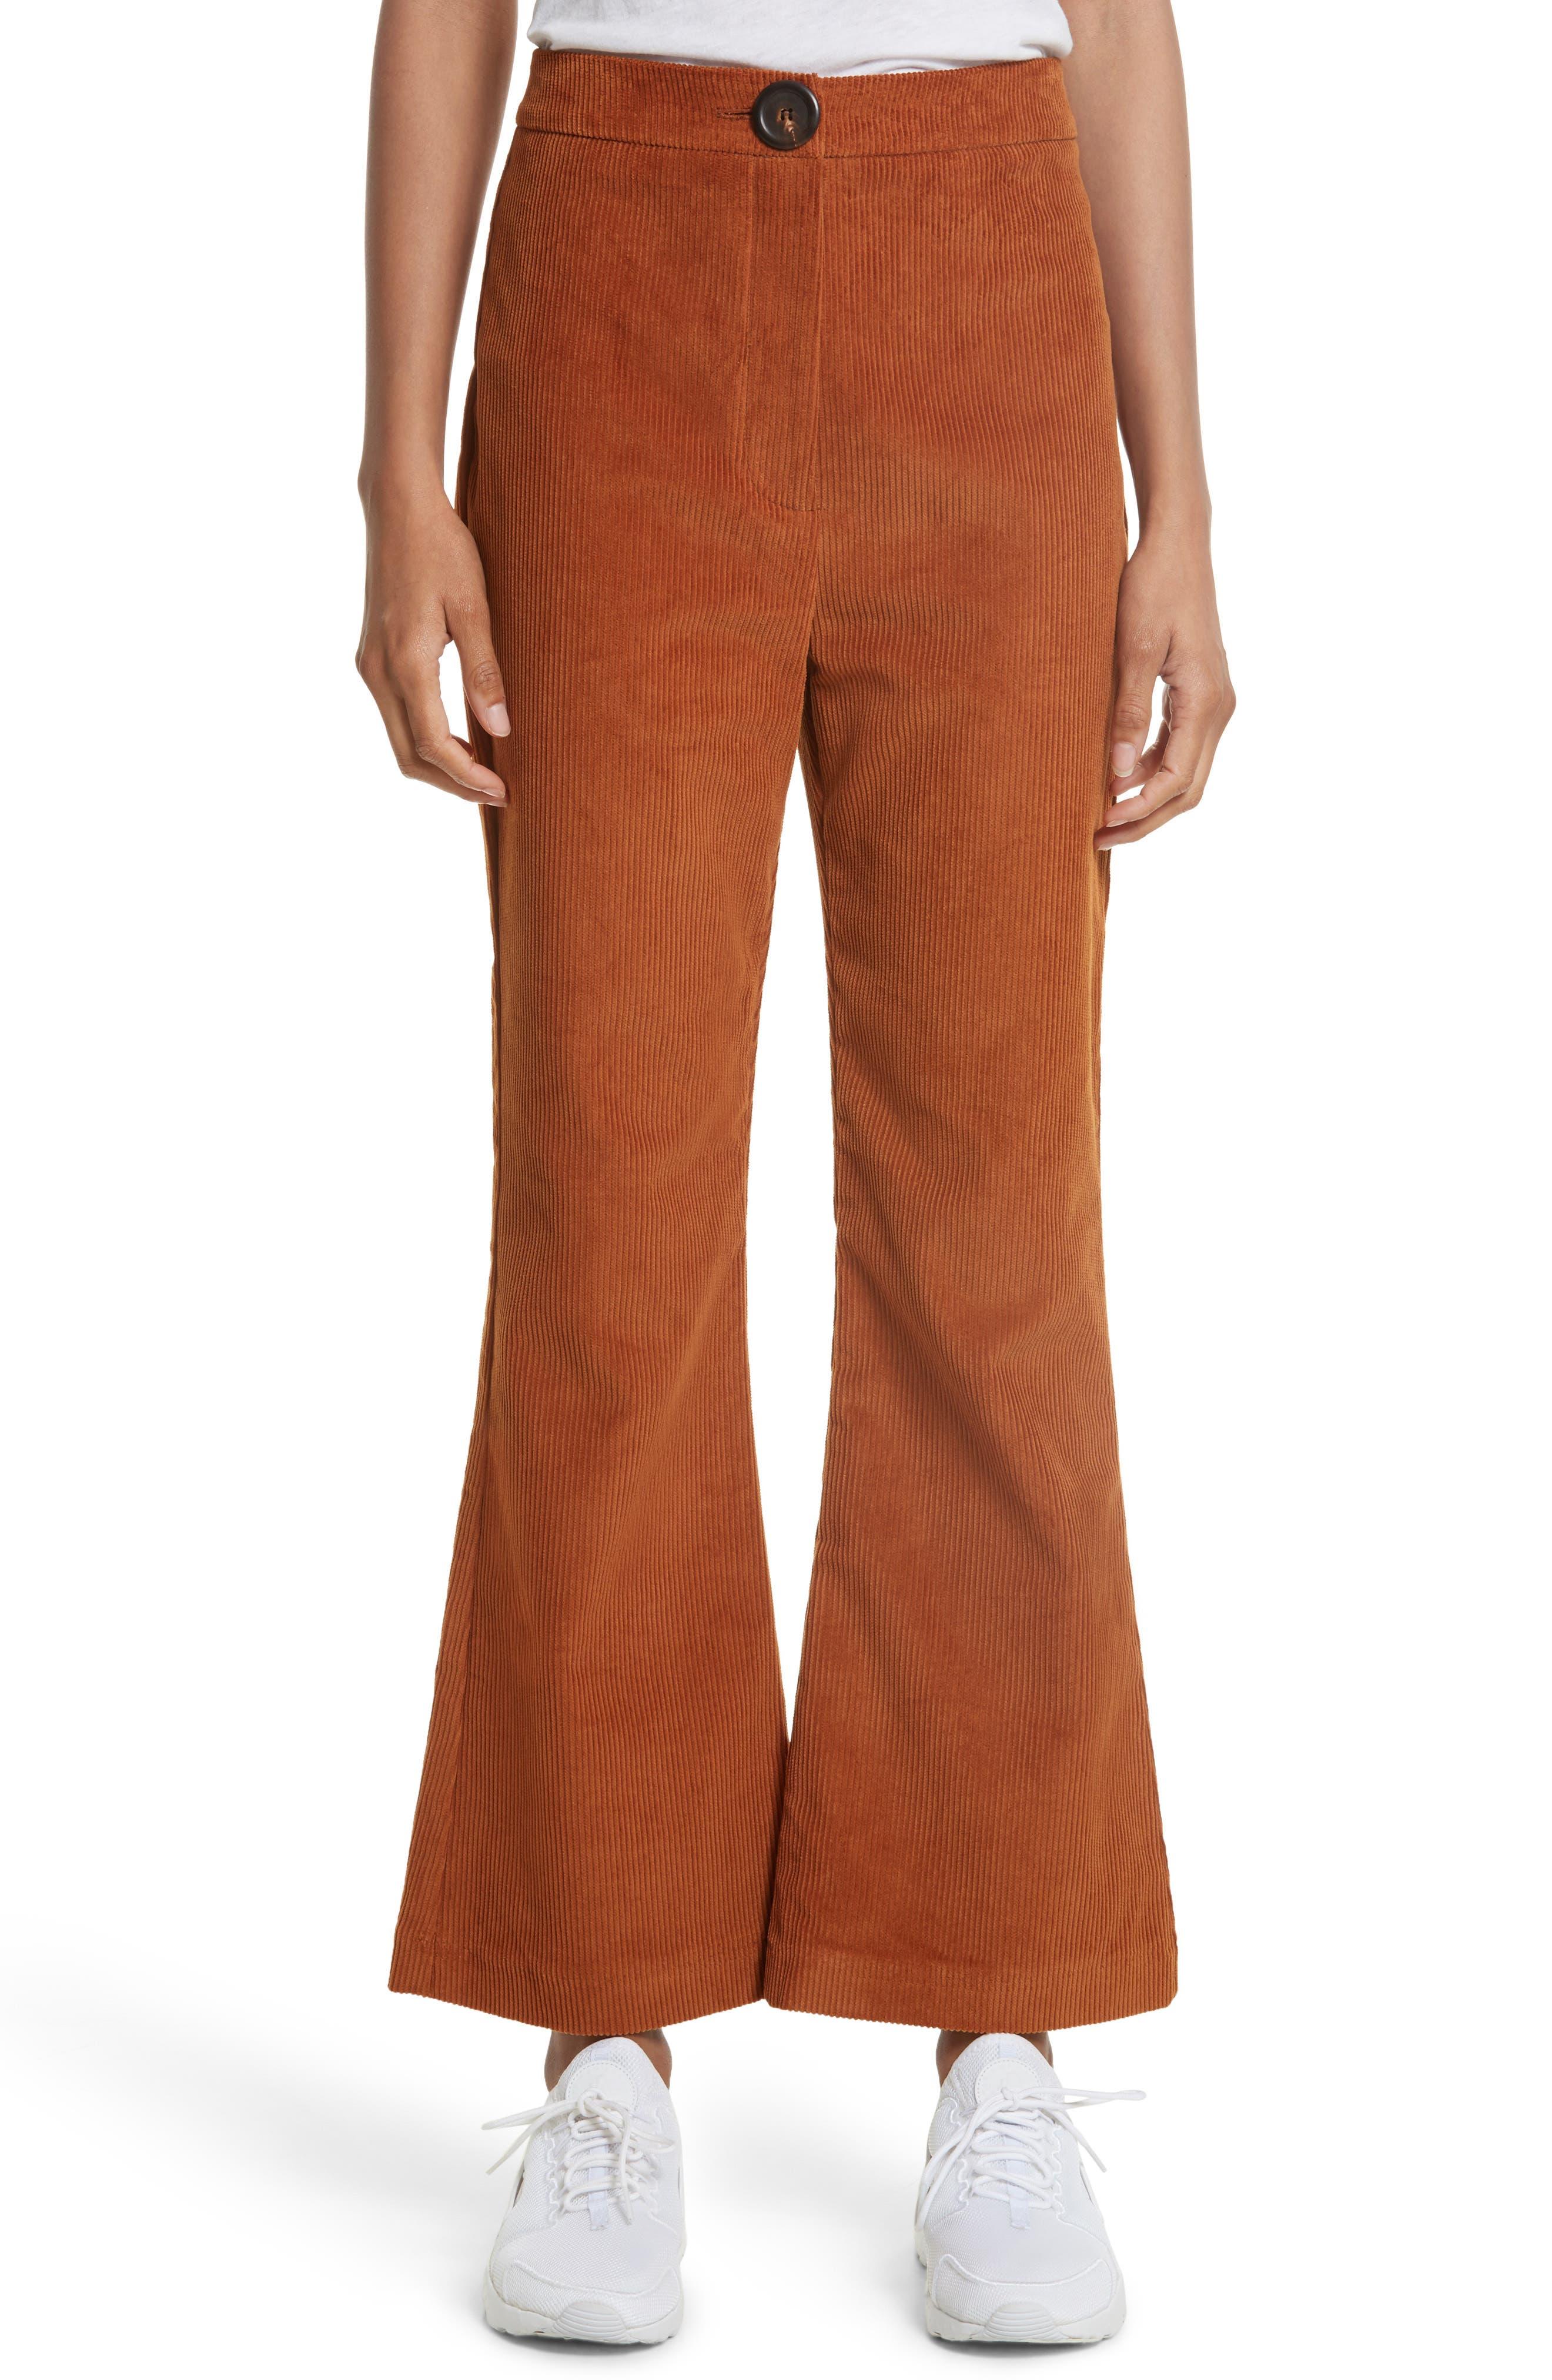 Main Image - A.W.A.K.E. Crop Flare Corduroy Trousers